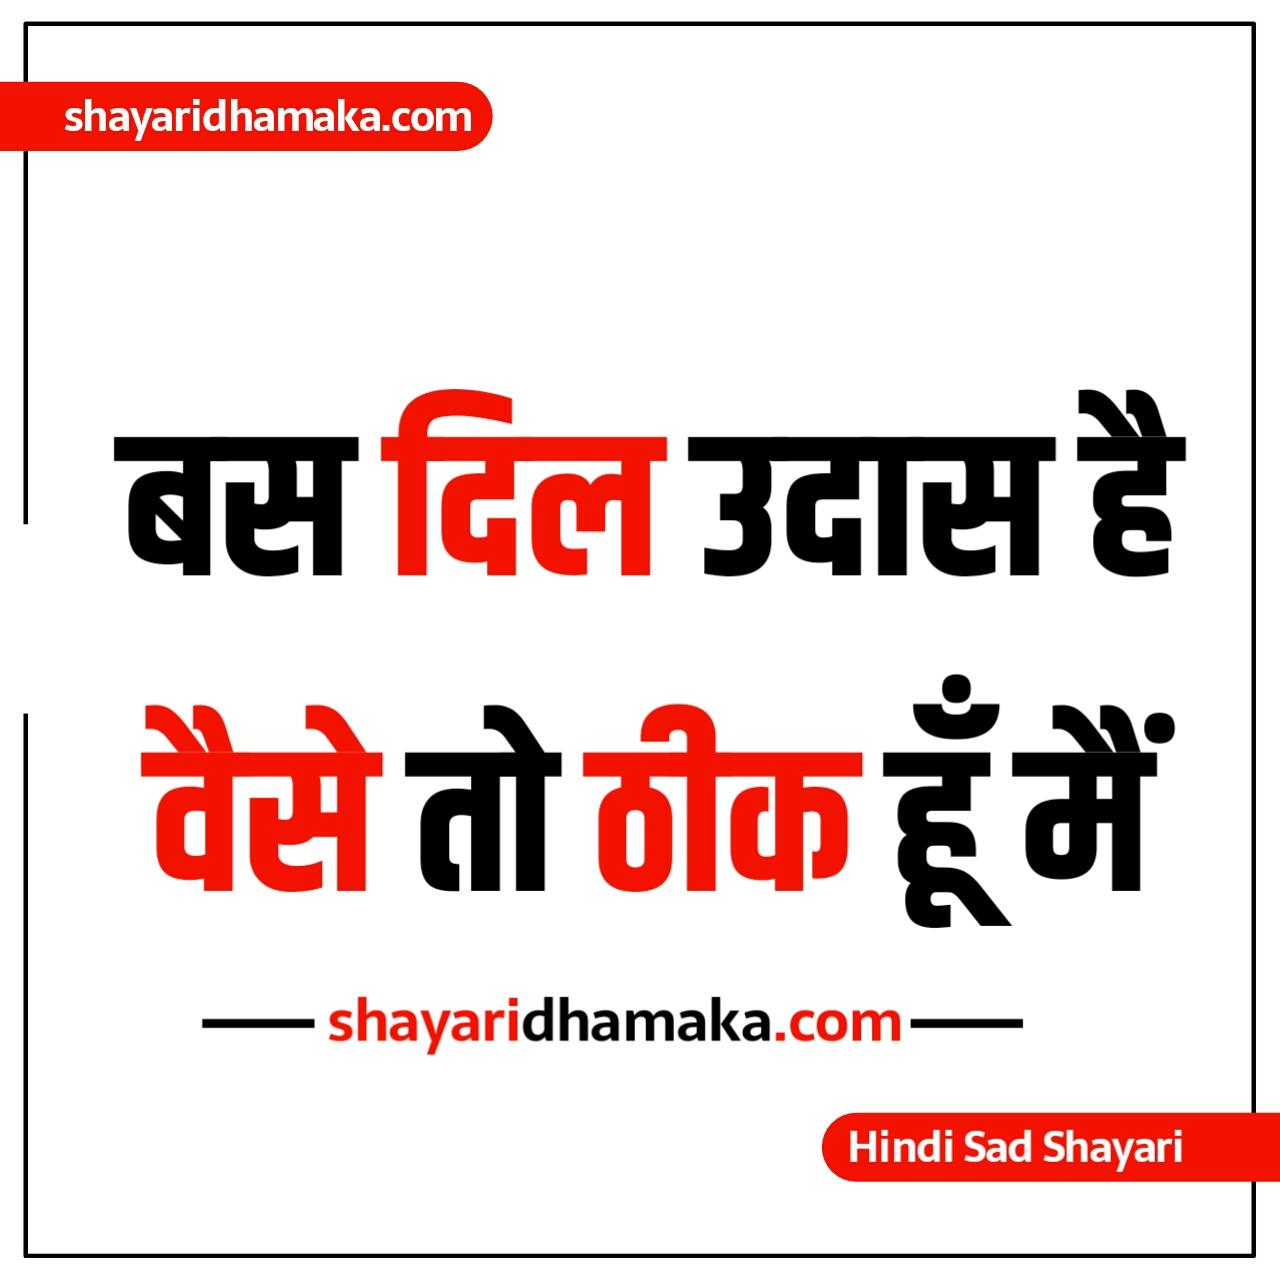 बस दिल उदास है - Hindi Sad Shayari